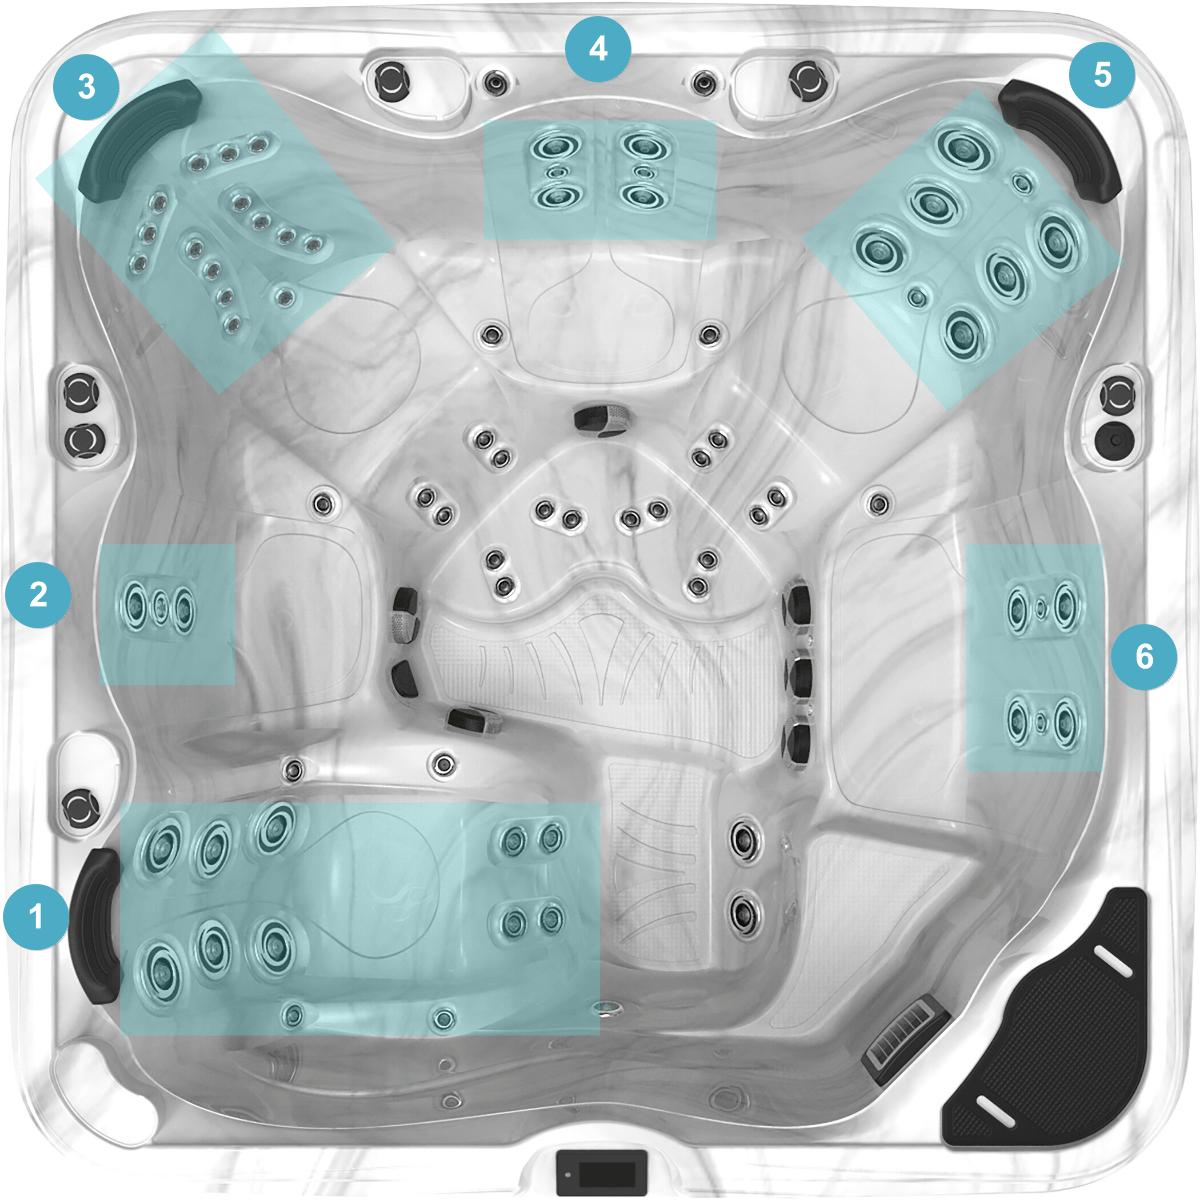 spa-bestlife-g74s-concept_piscine_design